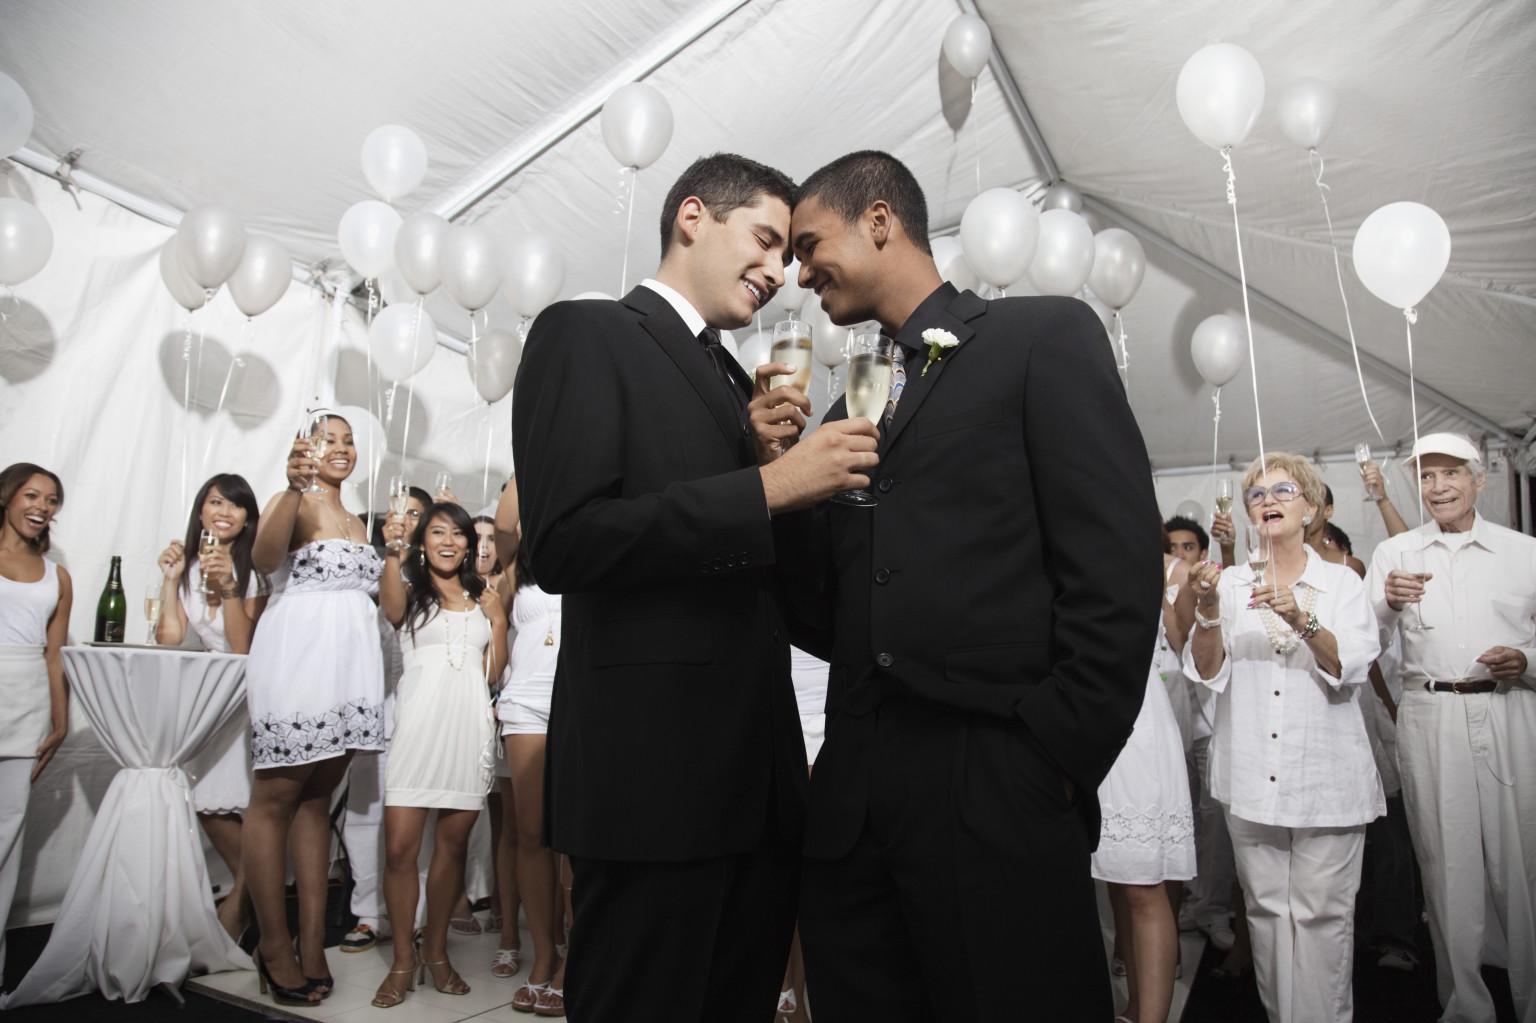 o-gay-wedding-kevin-swanson-facebook